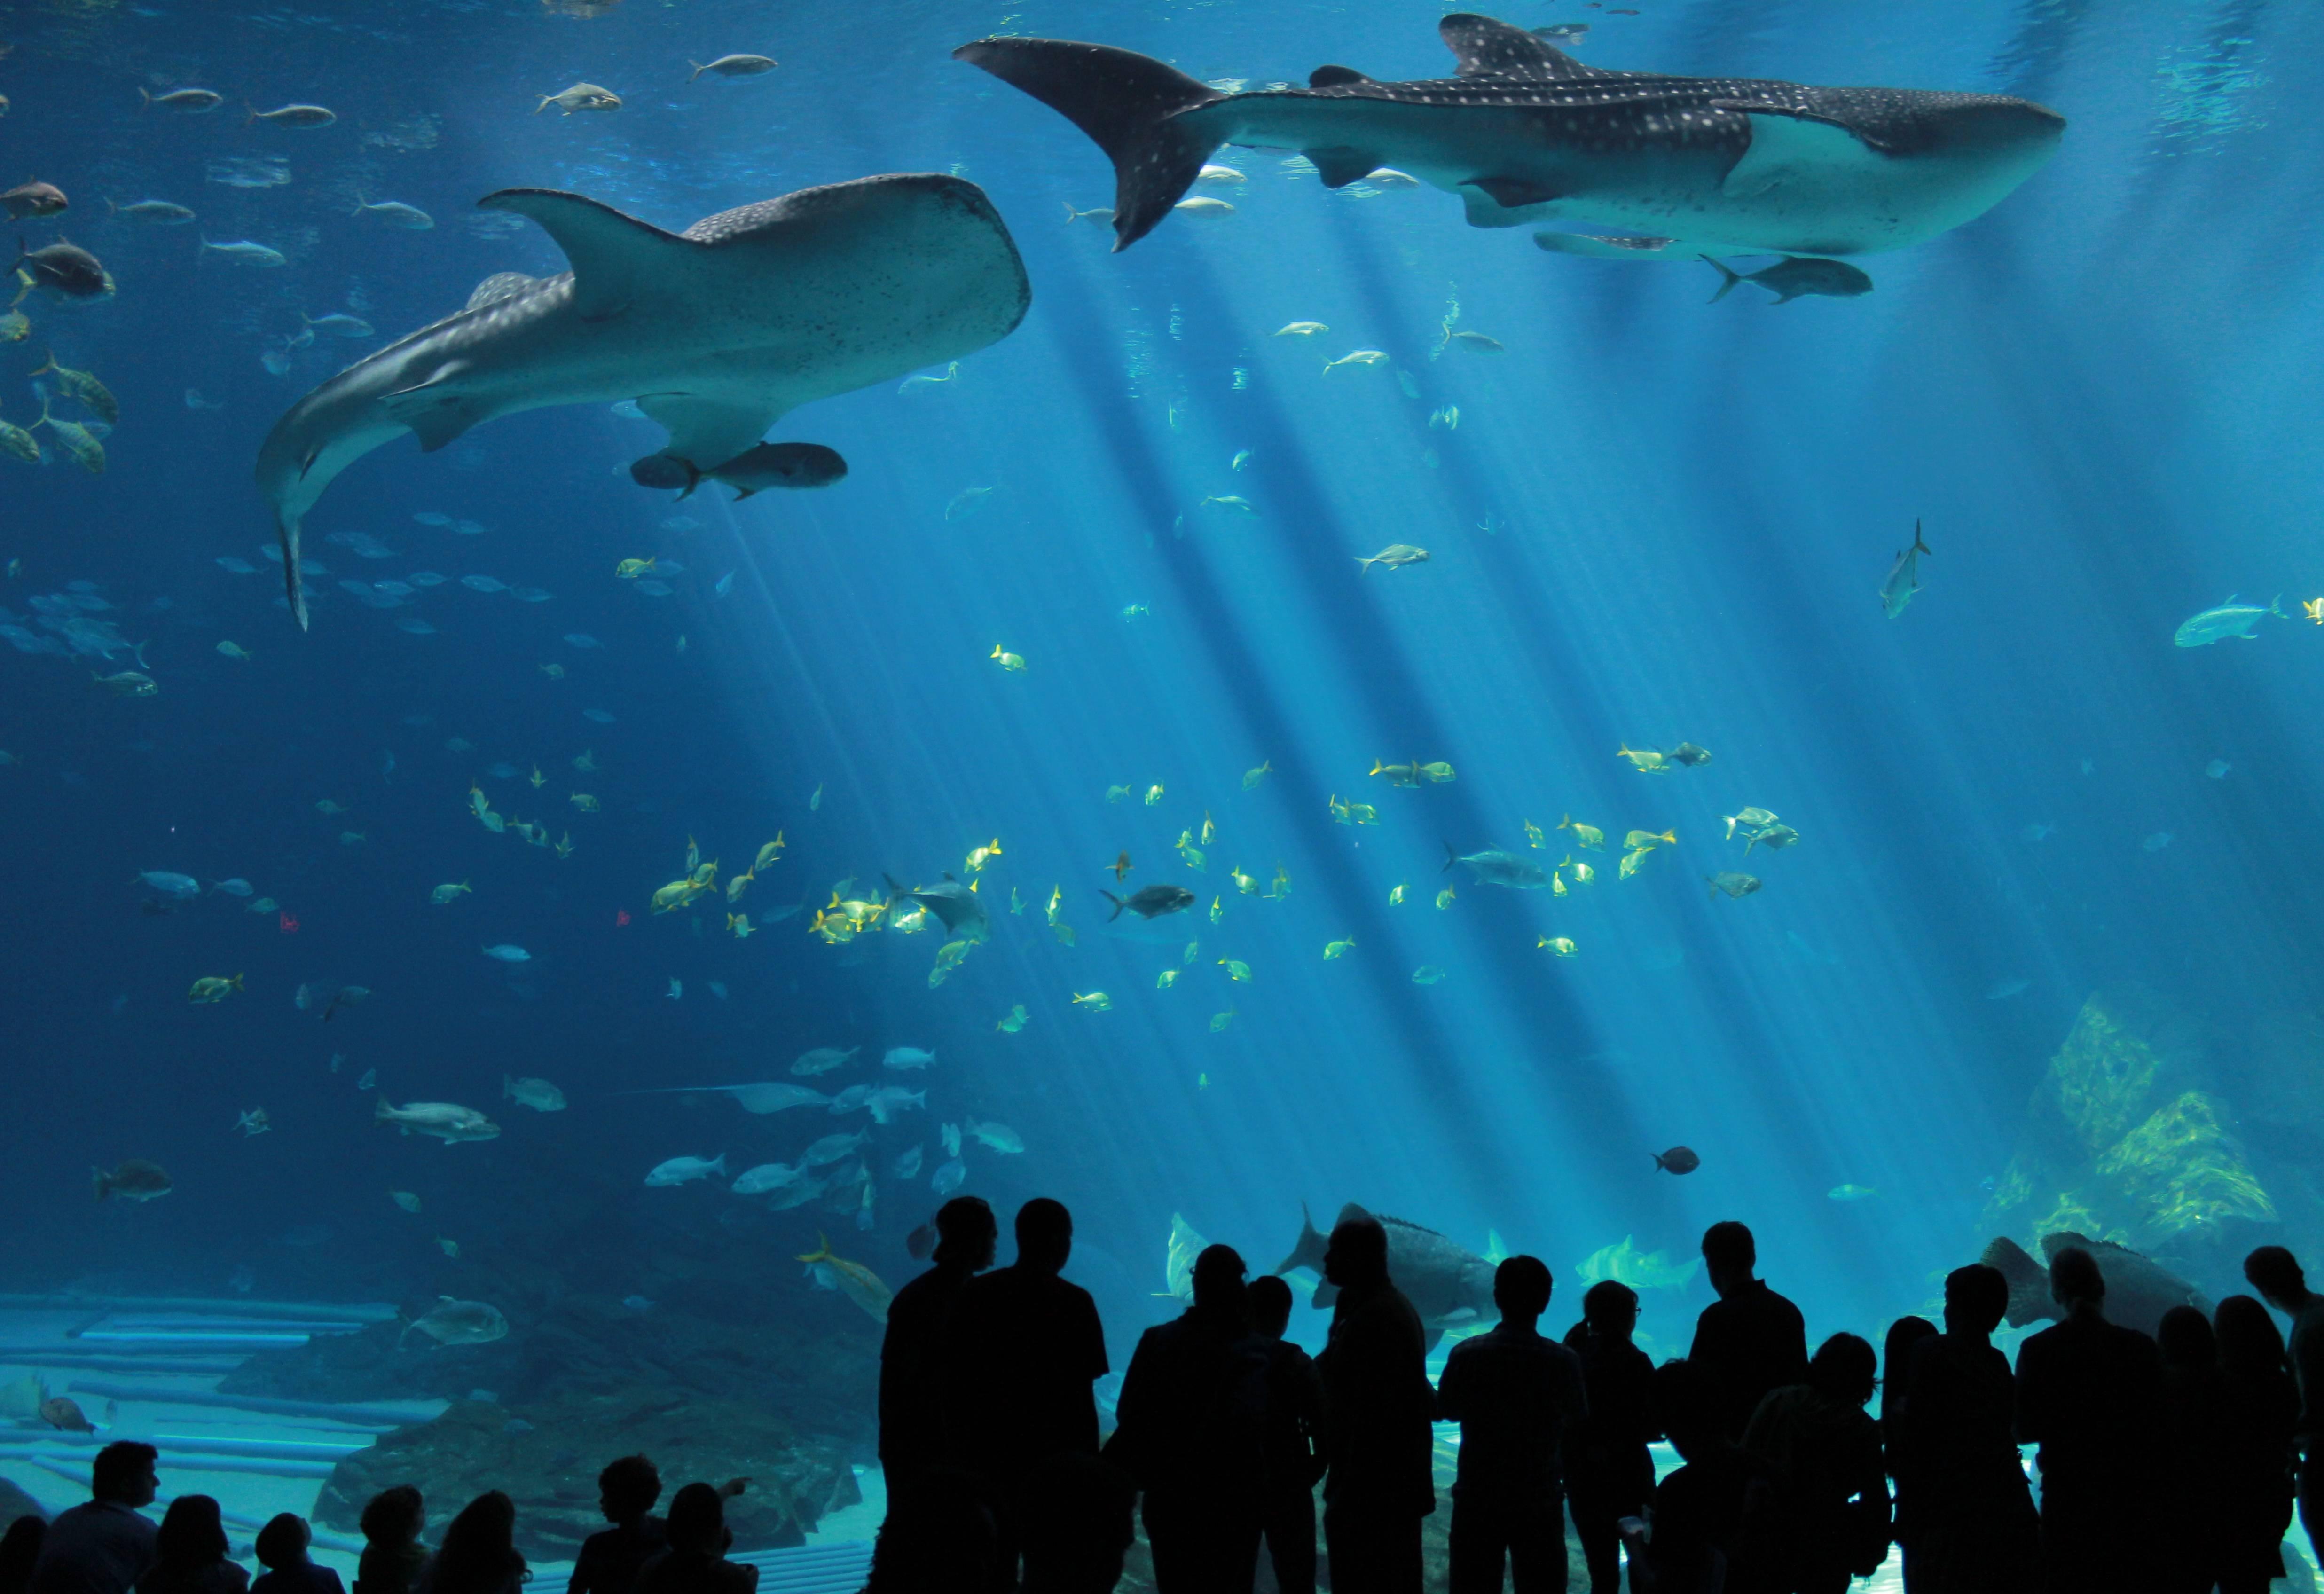 Whale sharks in the Atlanta aquarium : pics